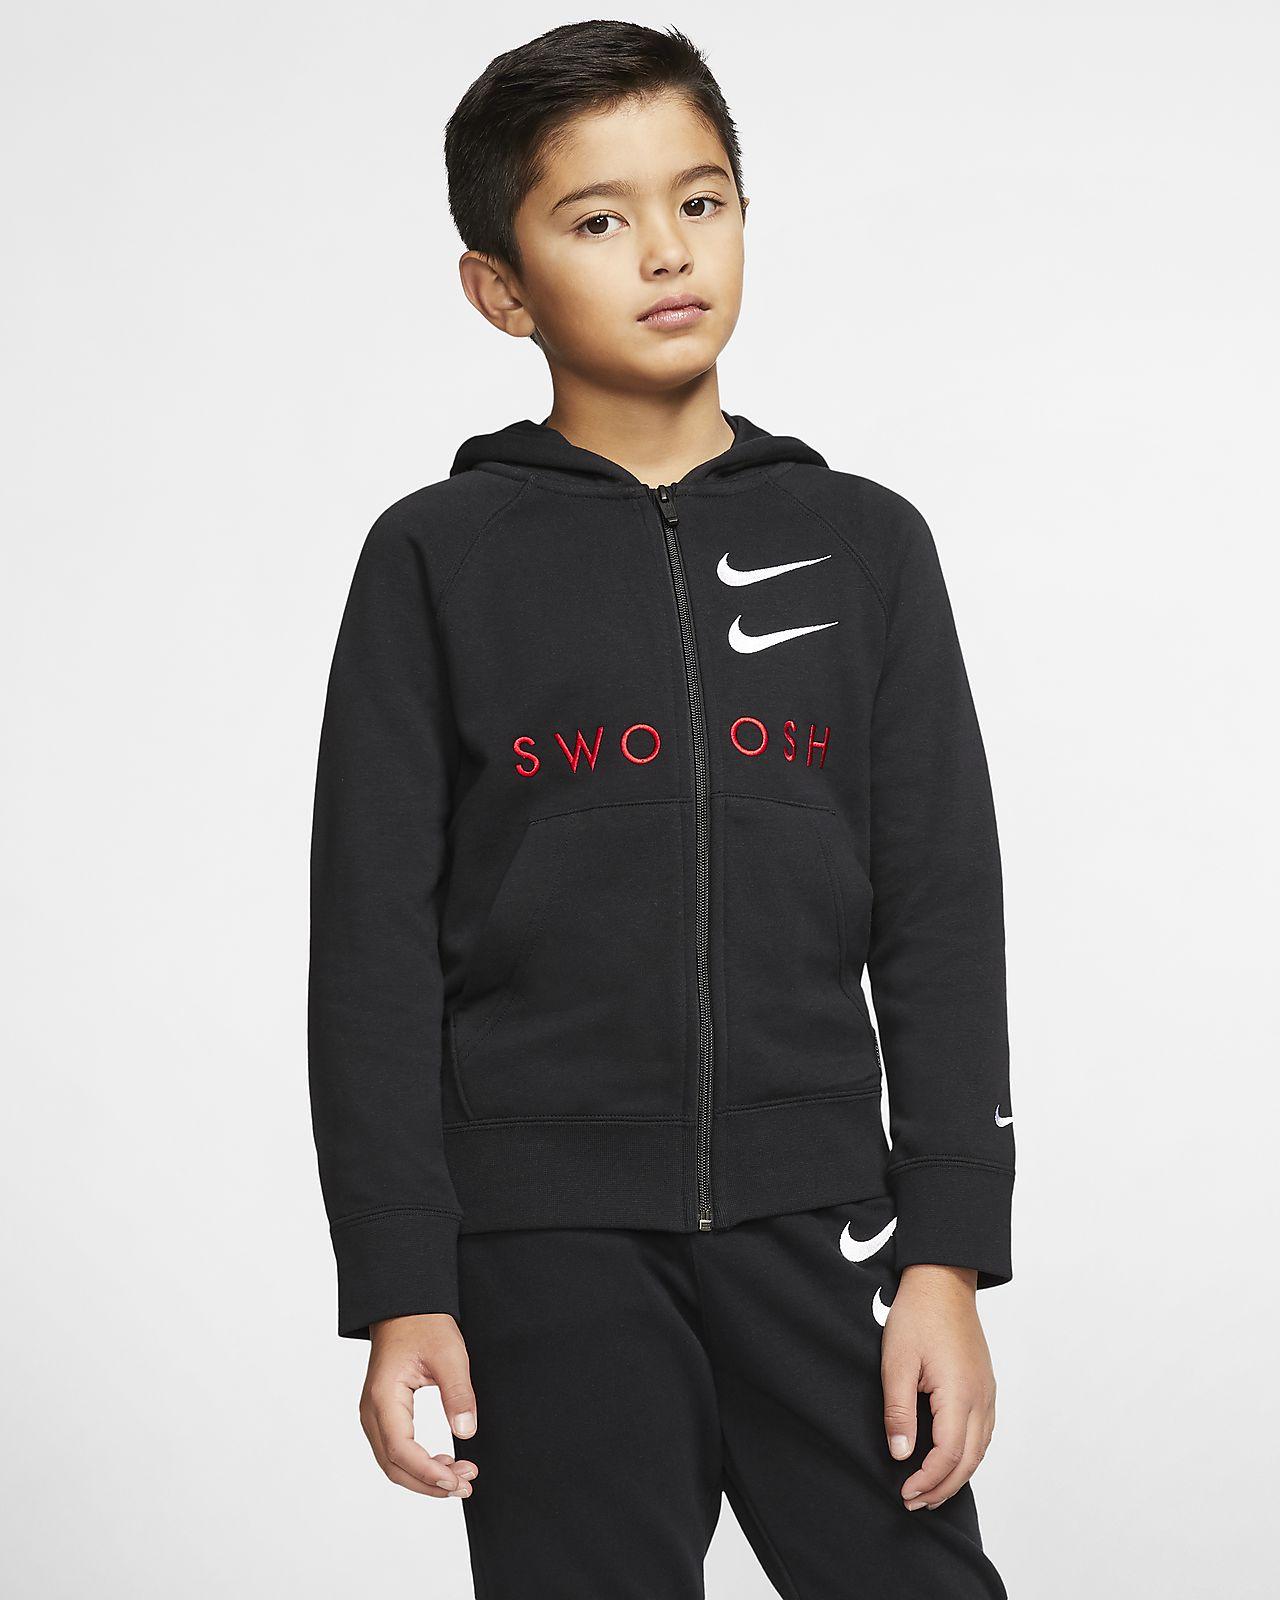 Nike Sportswear Swoosh Older Kids' (Boys') Full-Zip Hoodie